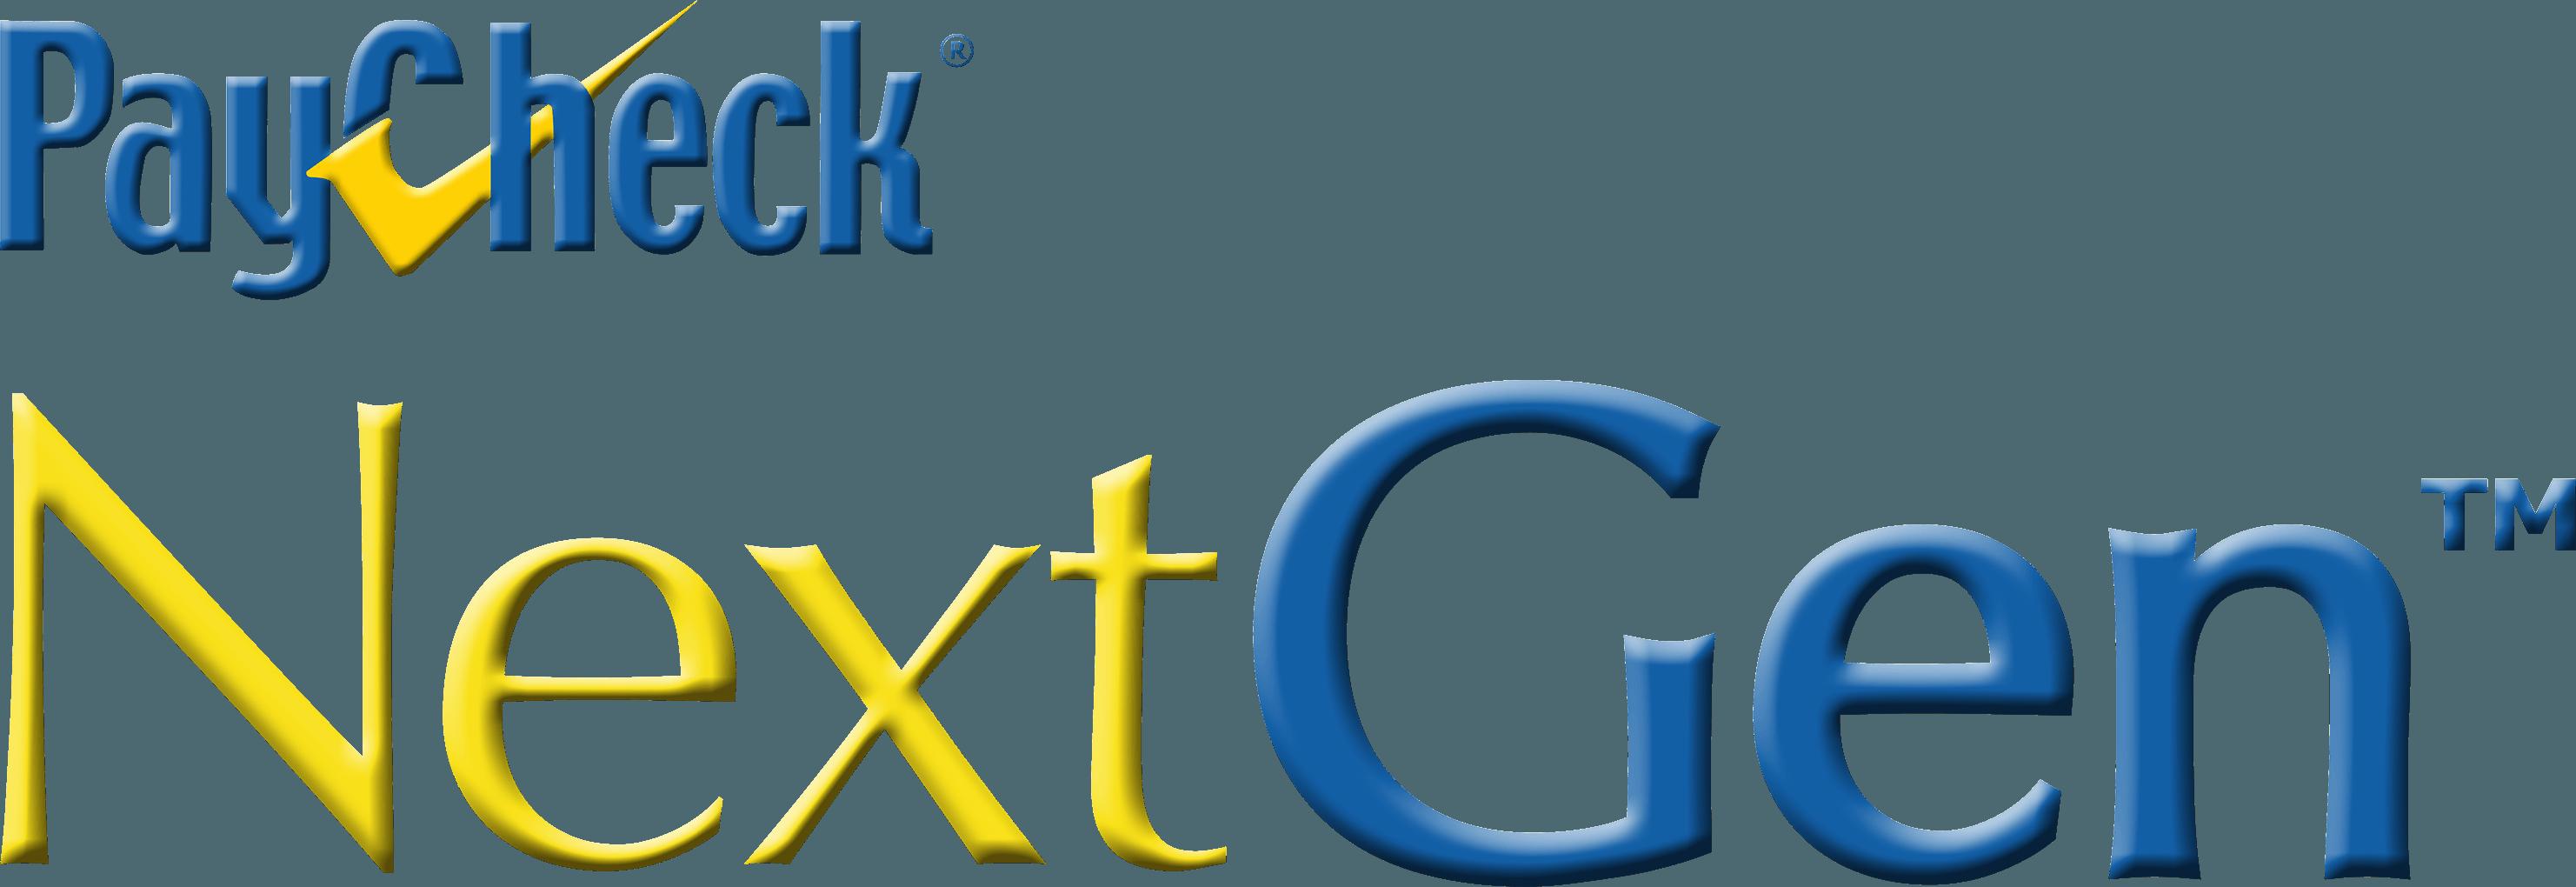 Paycheck NextGen